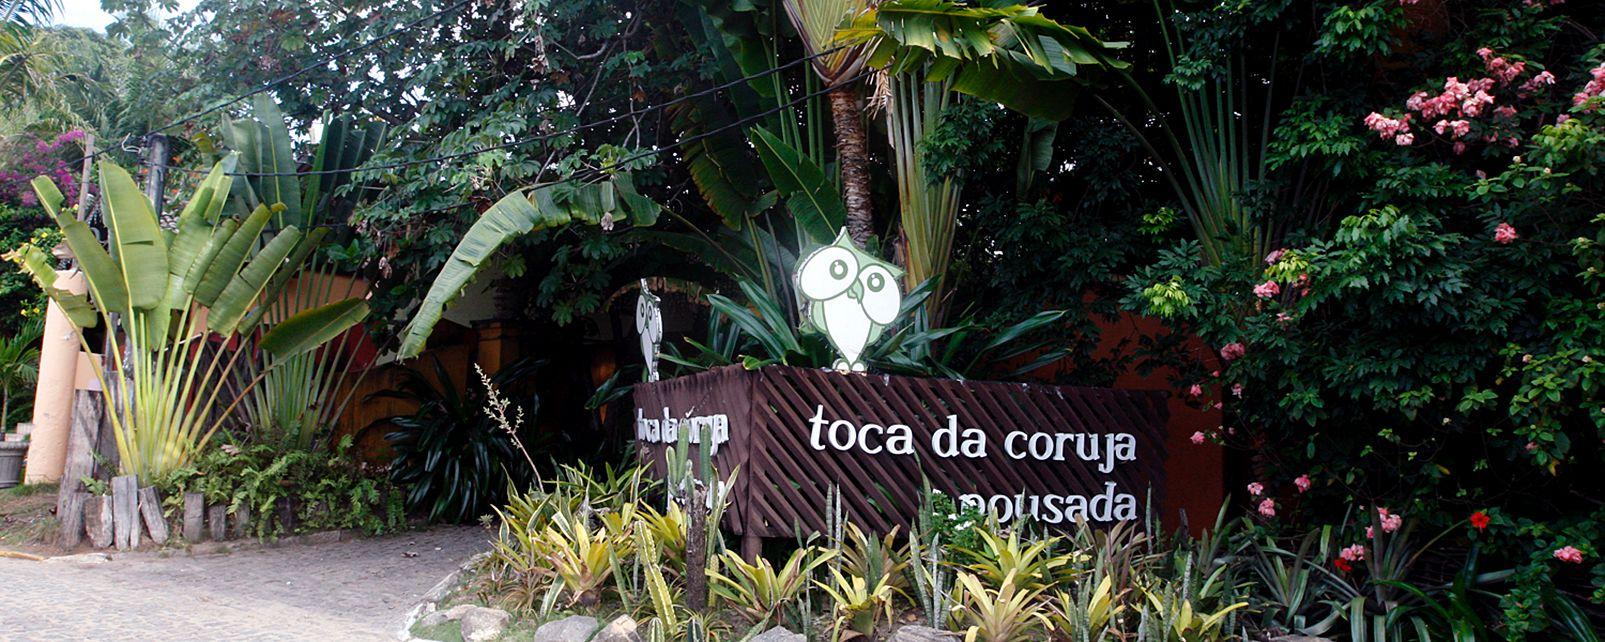 Hôtel Toca da Coruja